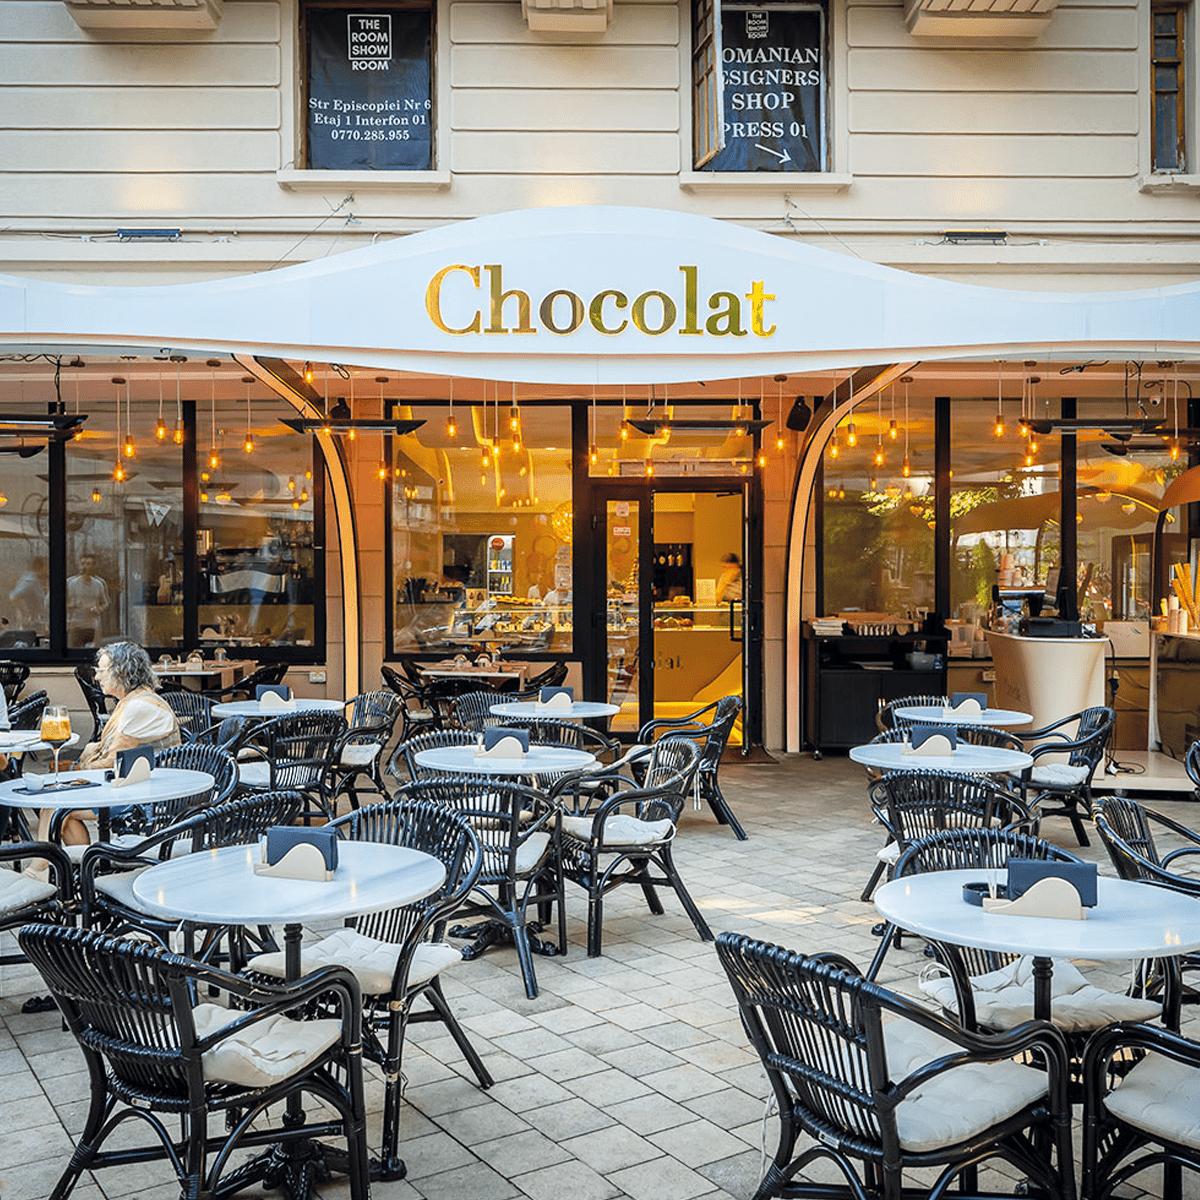 Chocolat by Bambó Blau